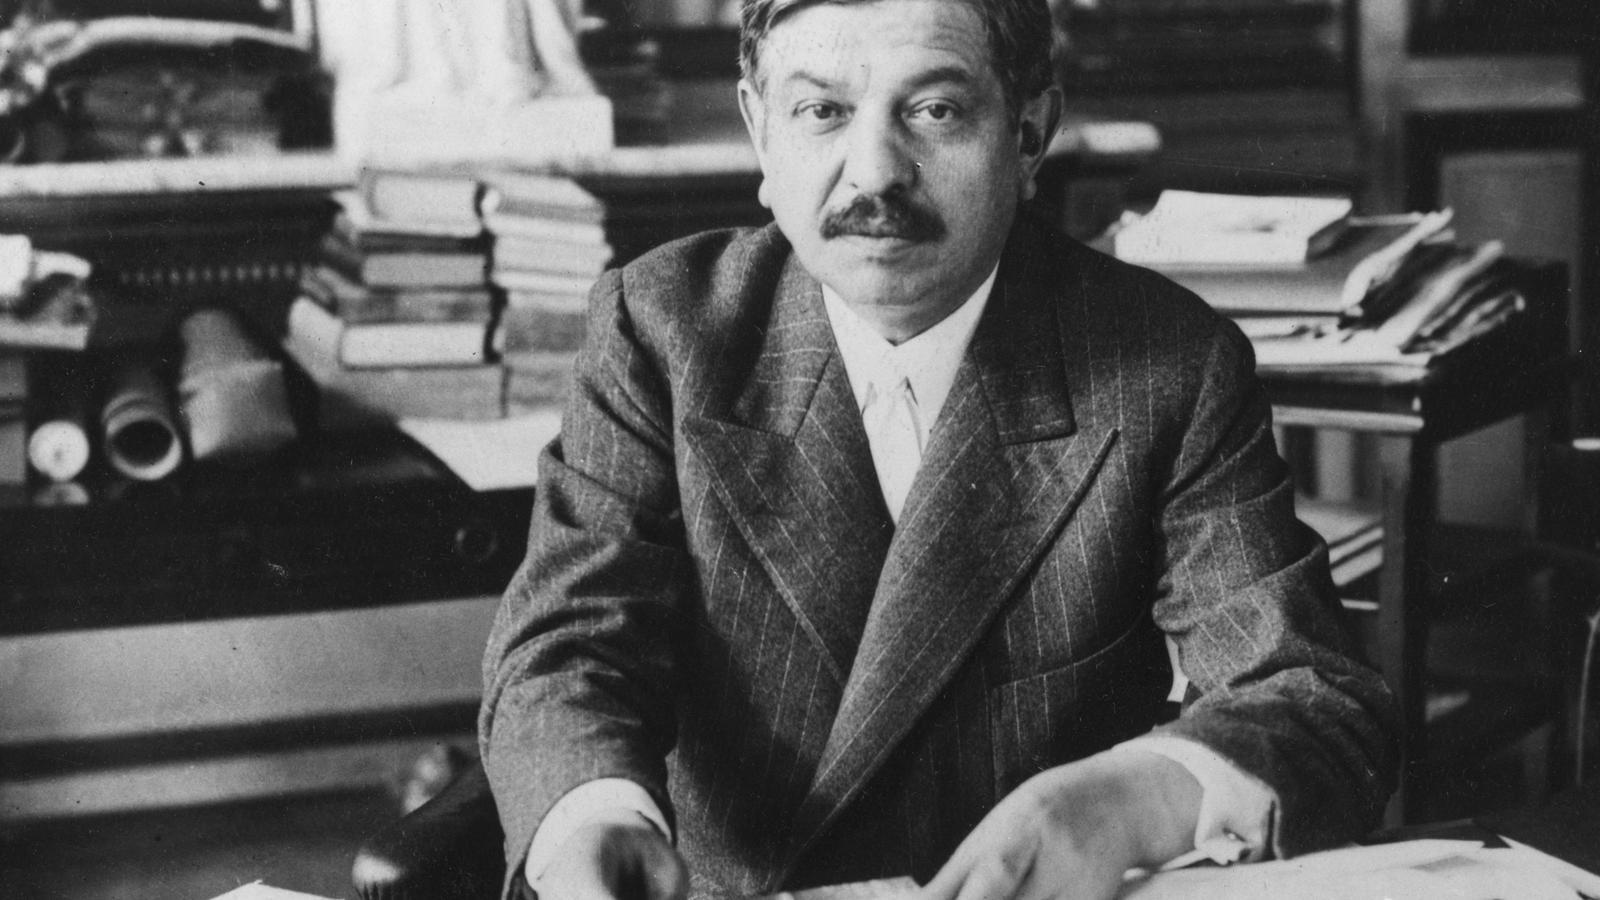 Pierre Laval, cap del govern de Vichy, col·laborador del règim nazi, va instigar el Maquis Blanc.